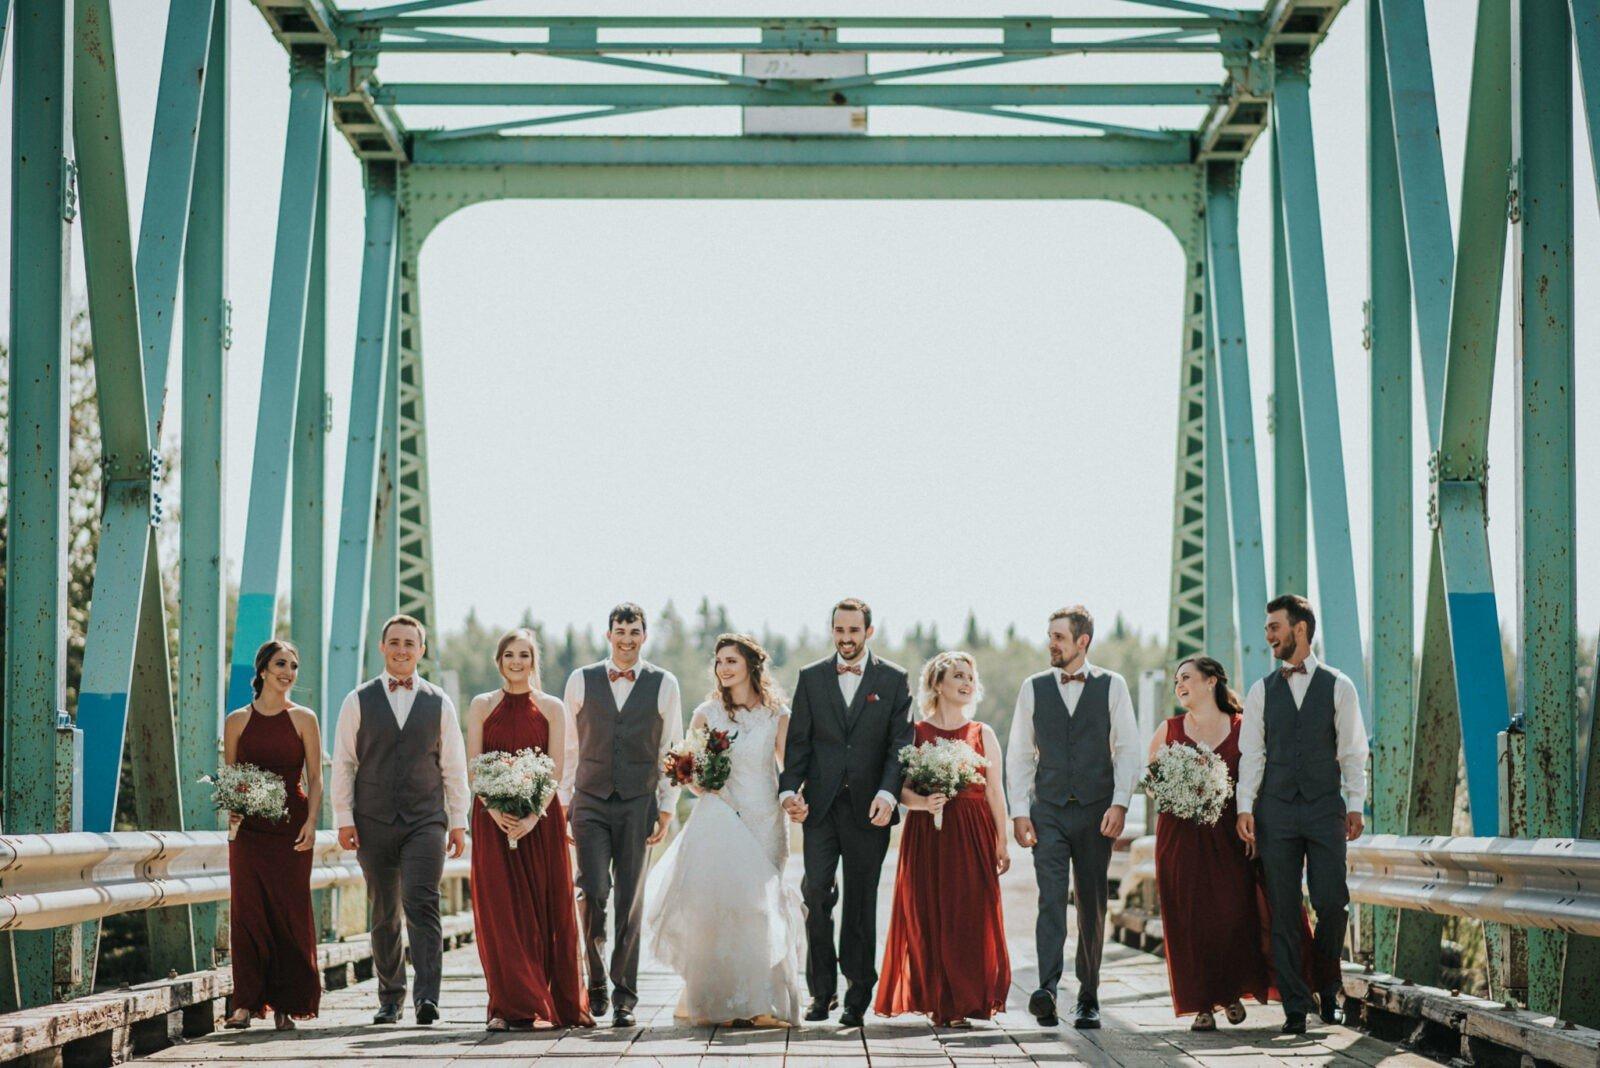 central alberta wedding ceremony